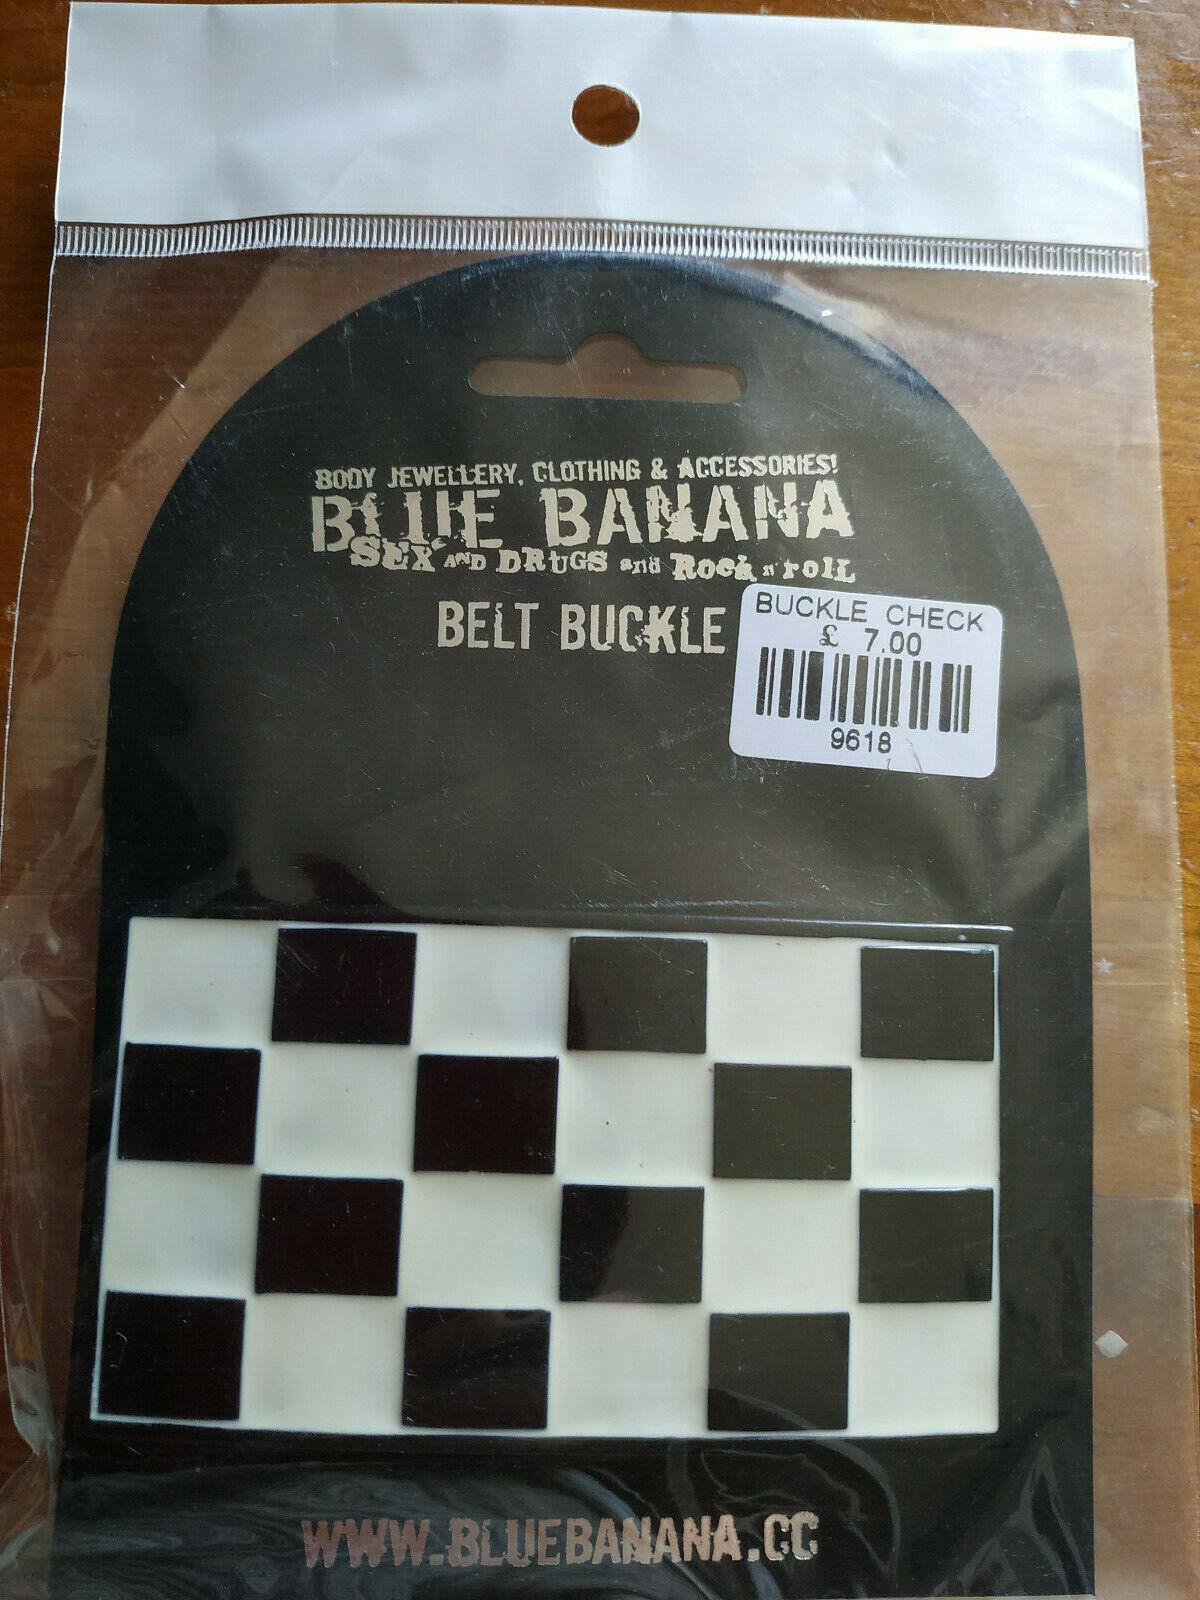 13128) Black and white check rectangular belt buckle BNIP Blue Banana